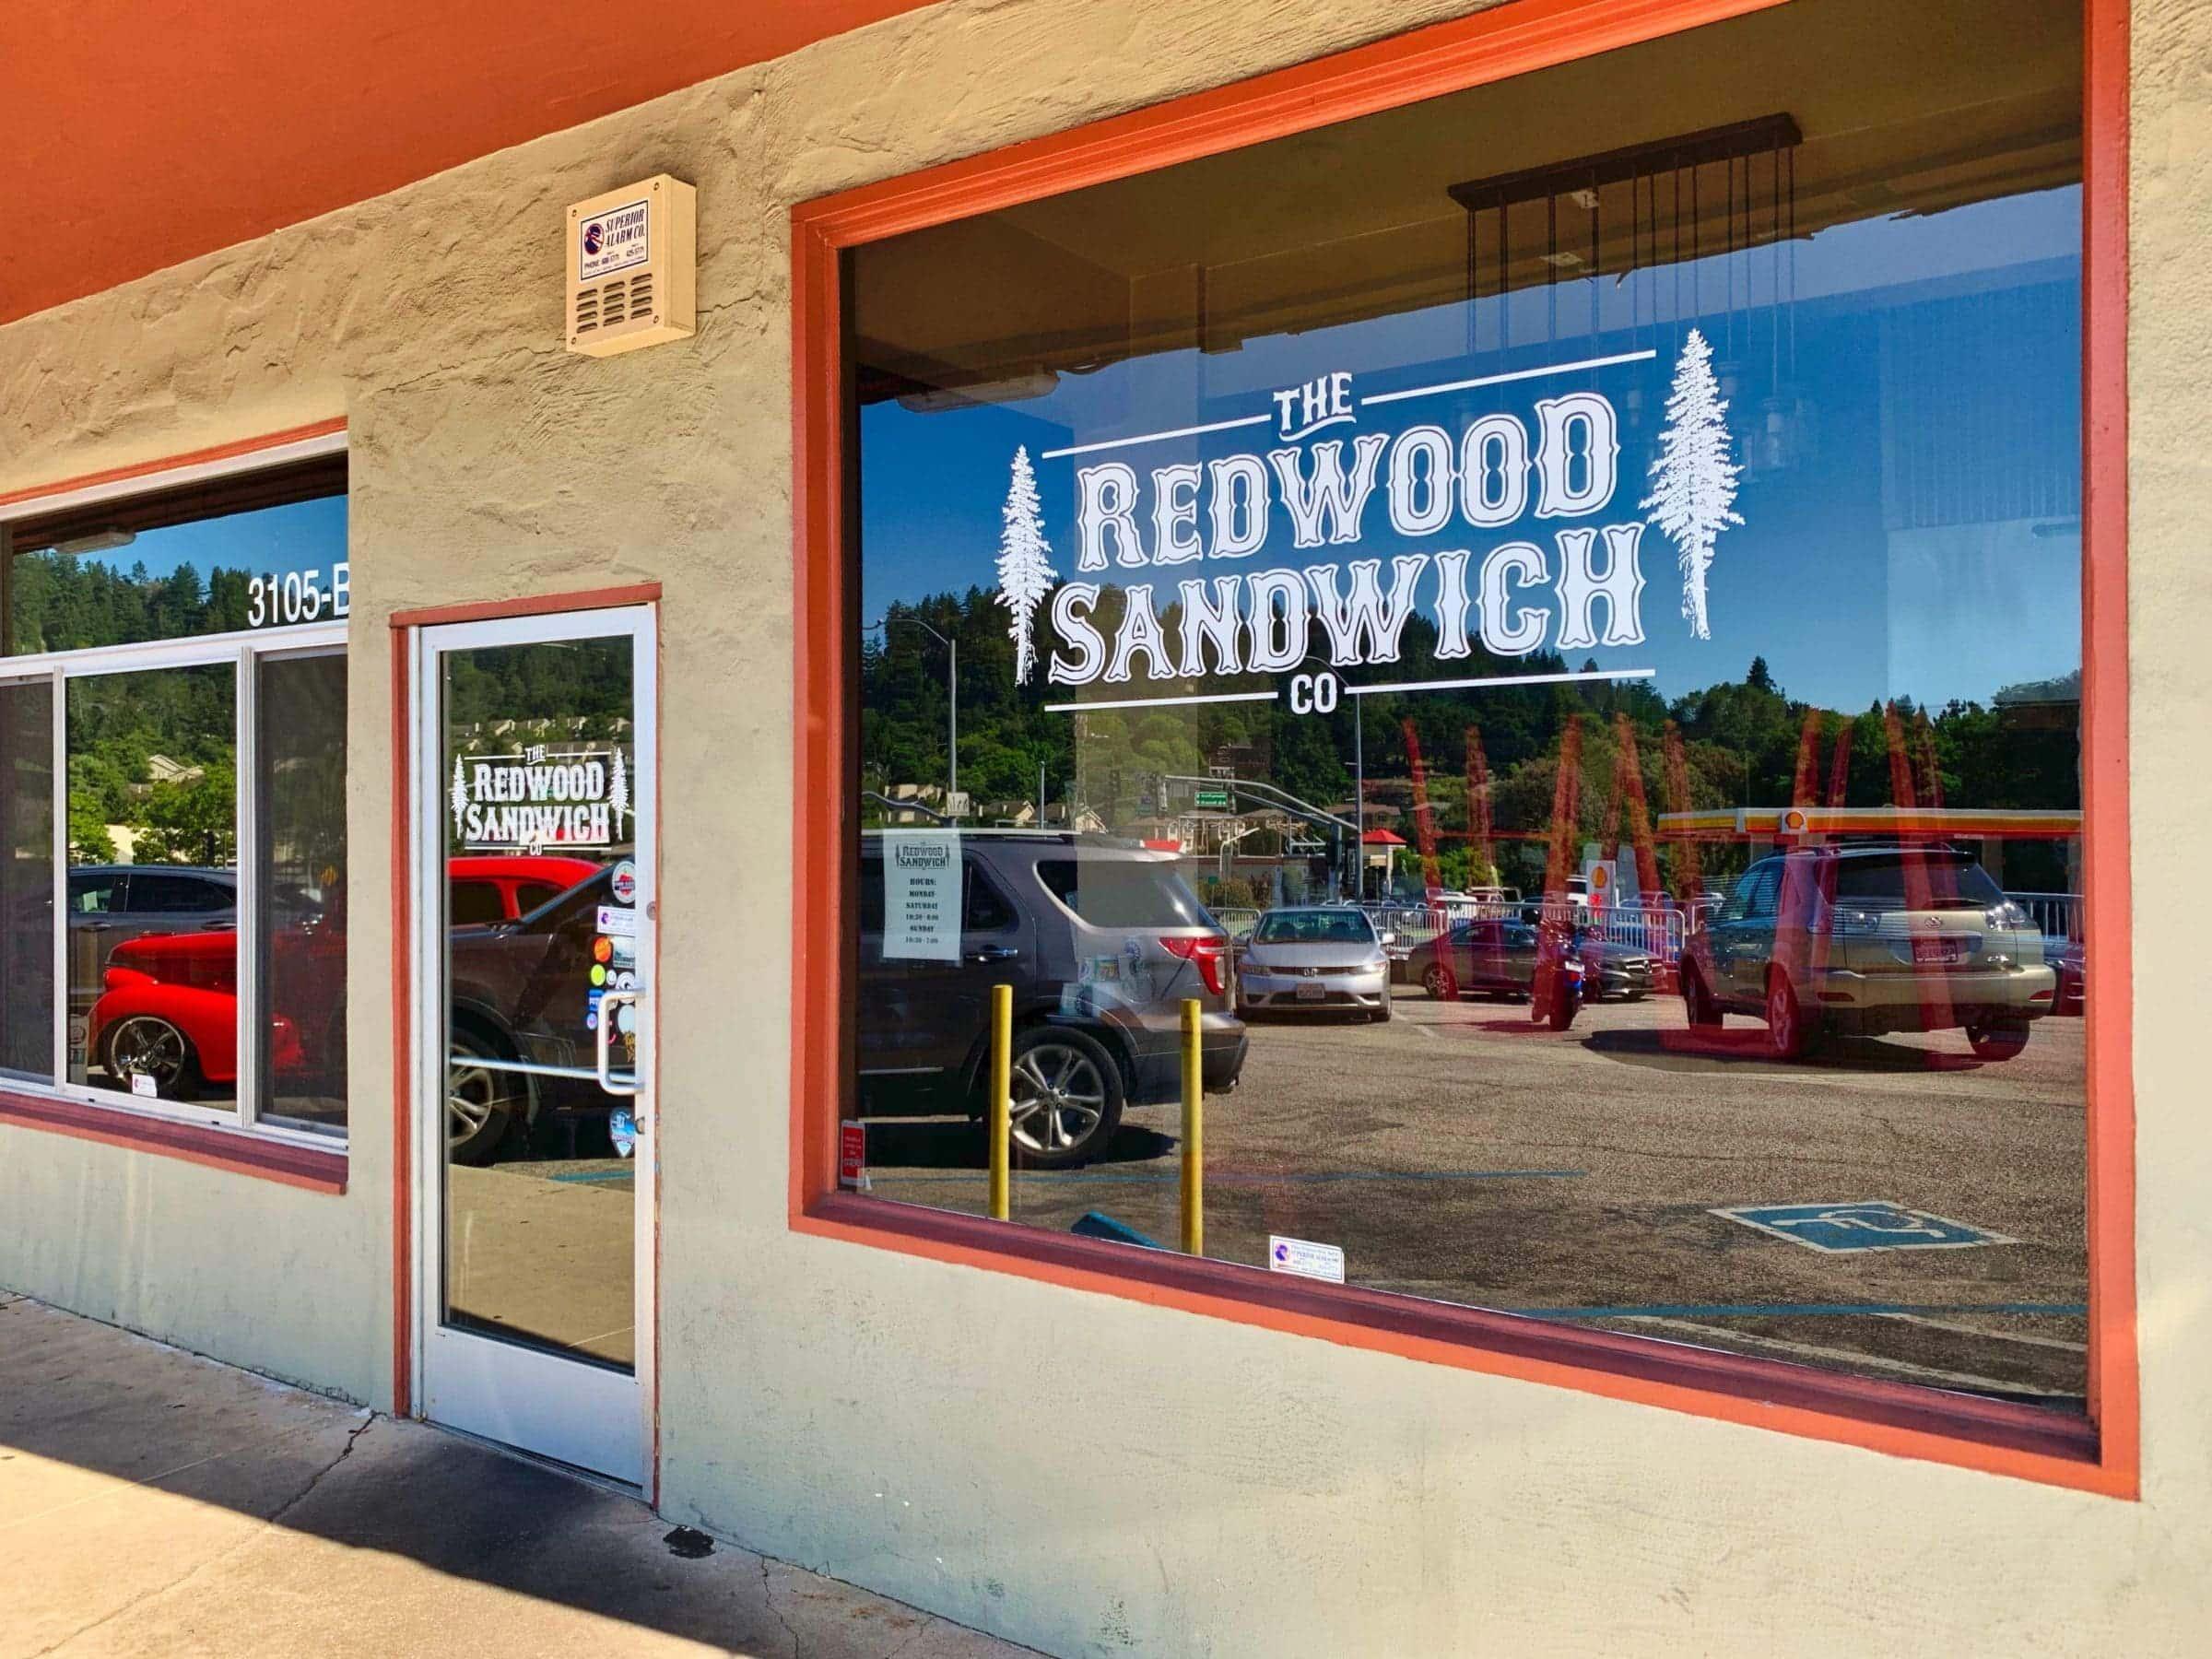 Redwood sandwich scotts valley